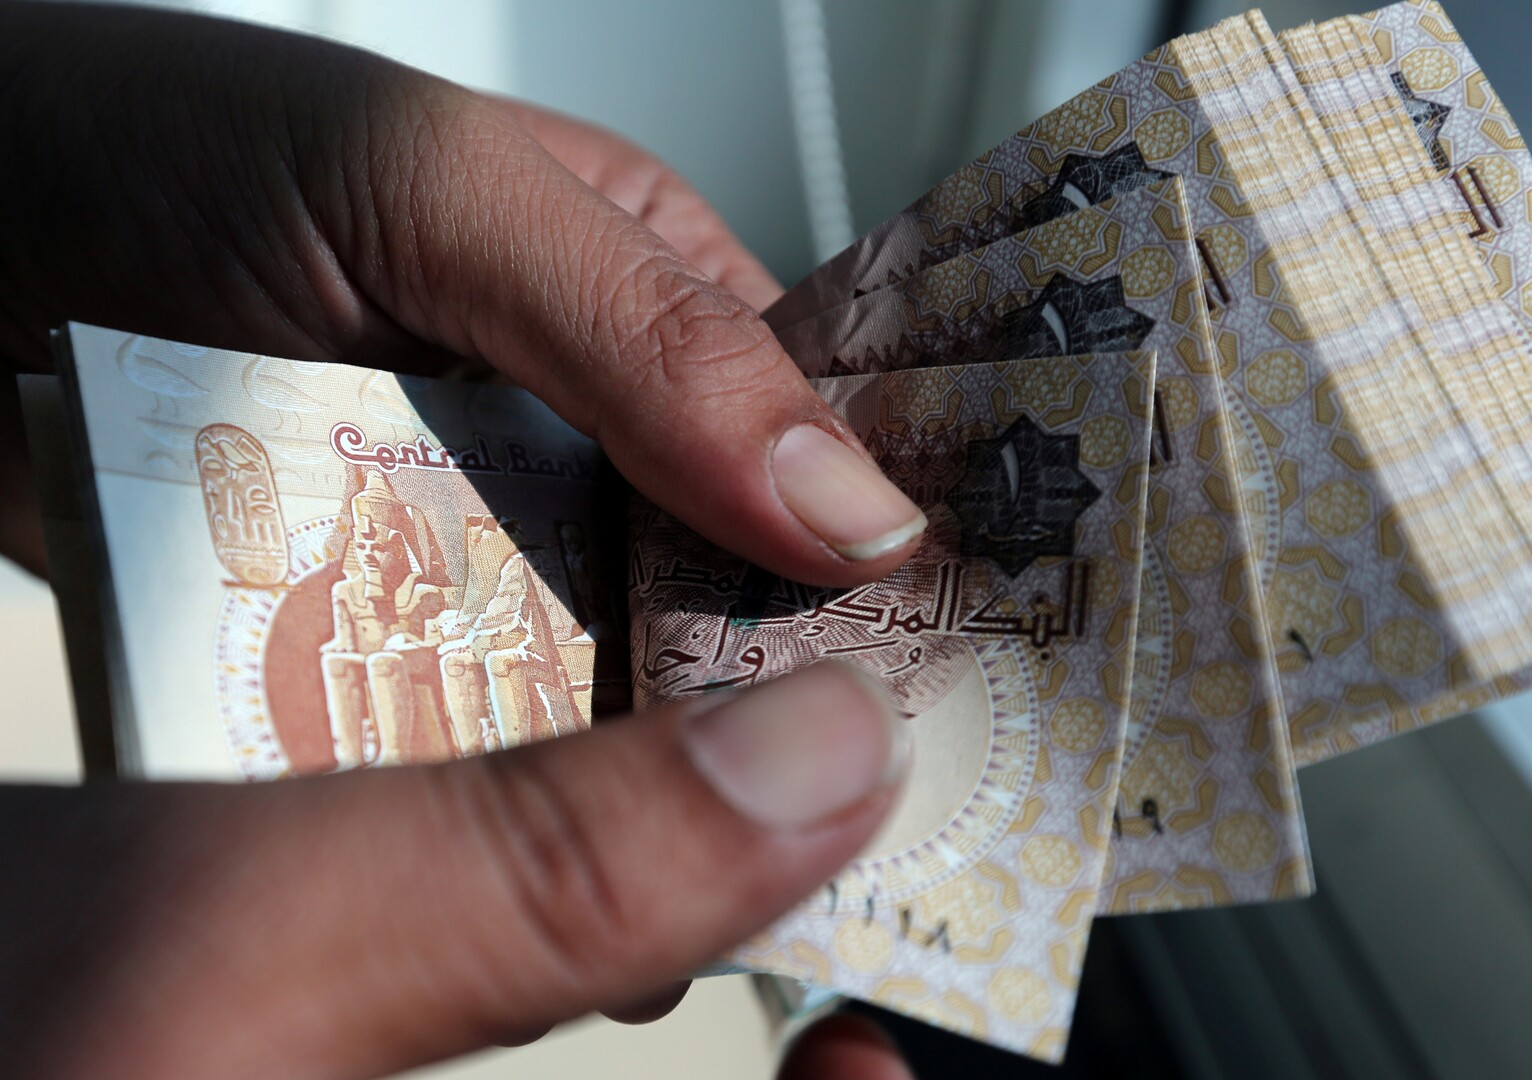 مصر تنجح في إصدار سندات بـ2.5 مليار جنيه